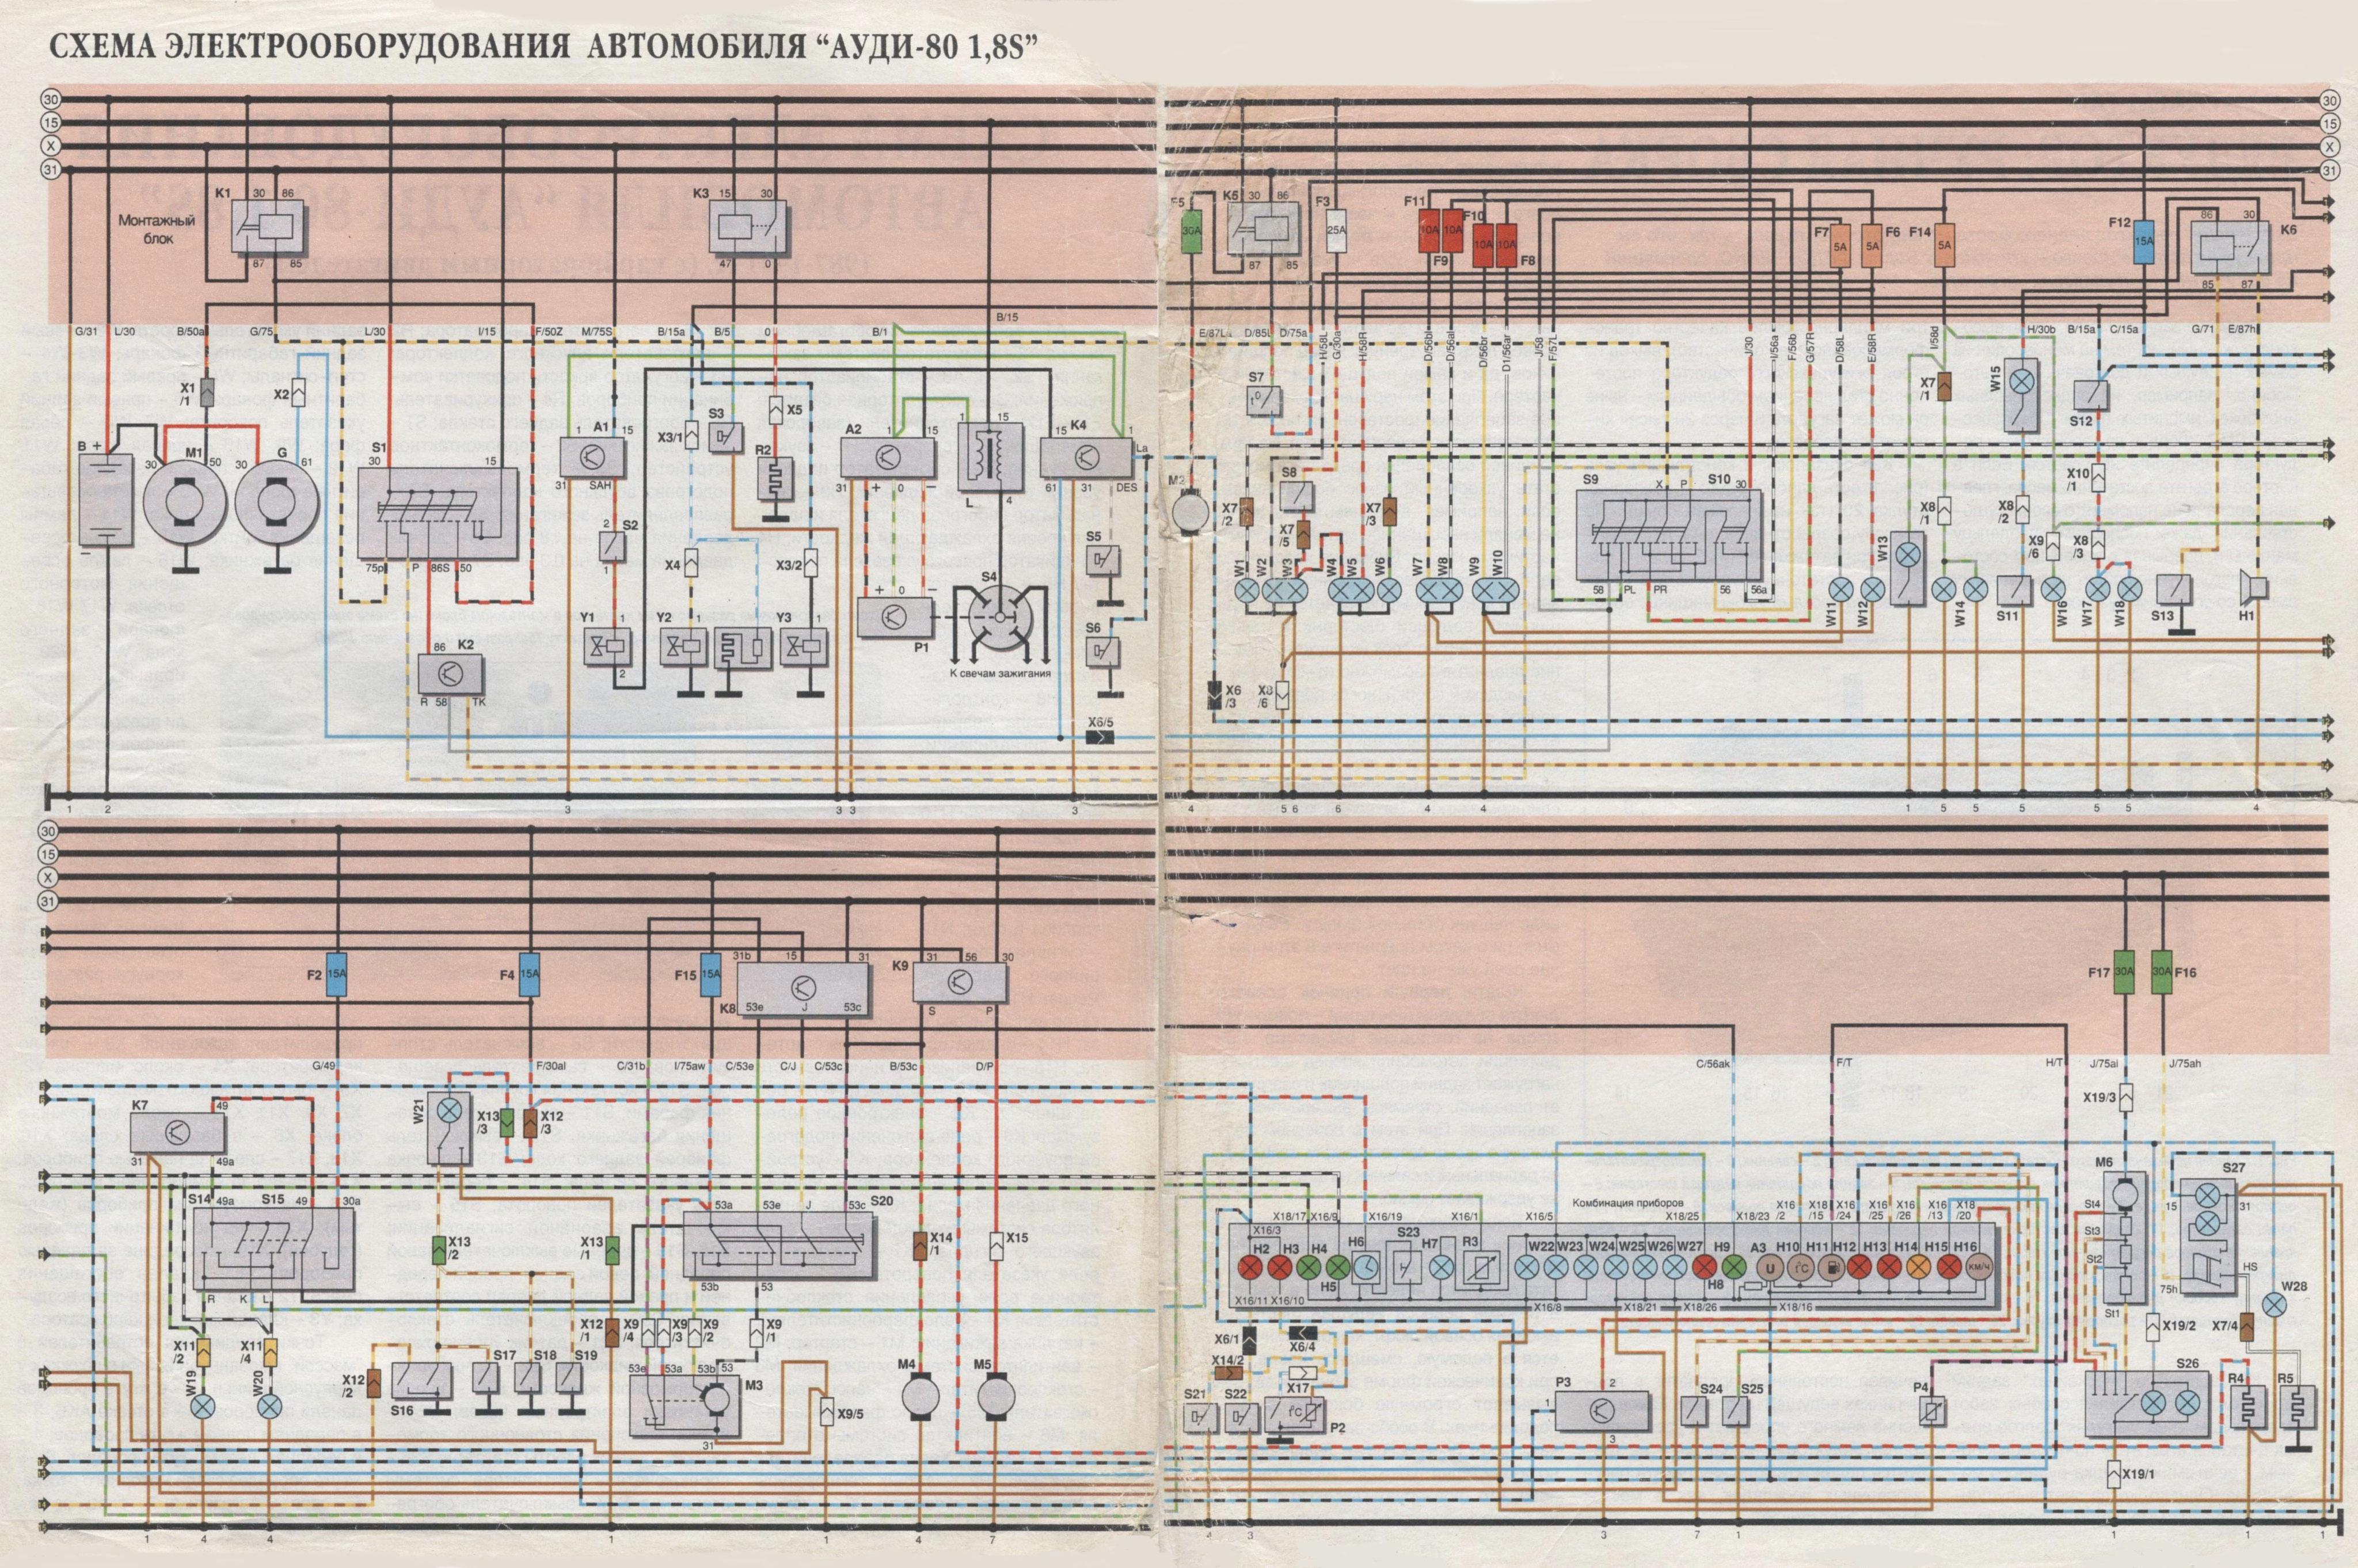 AUDI 80 Schematic wiring diagram - Сar PDF Manual, Wiring Diagram, Fault  Codes car pdf manuals